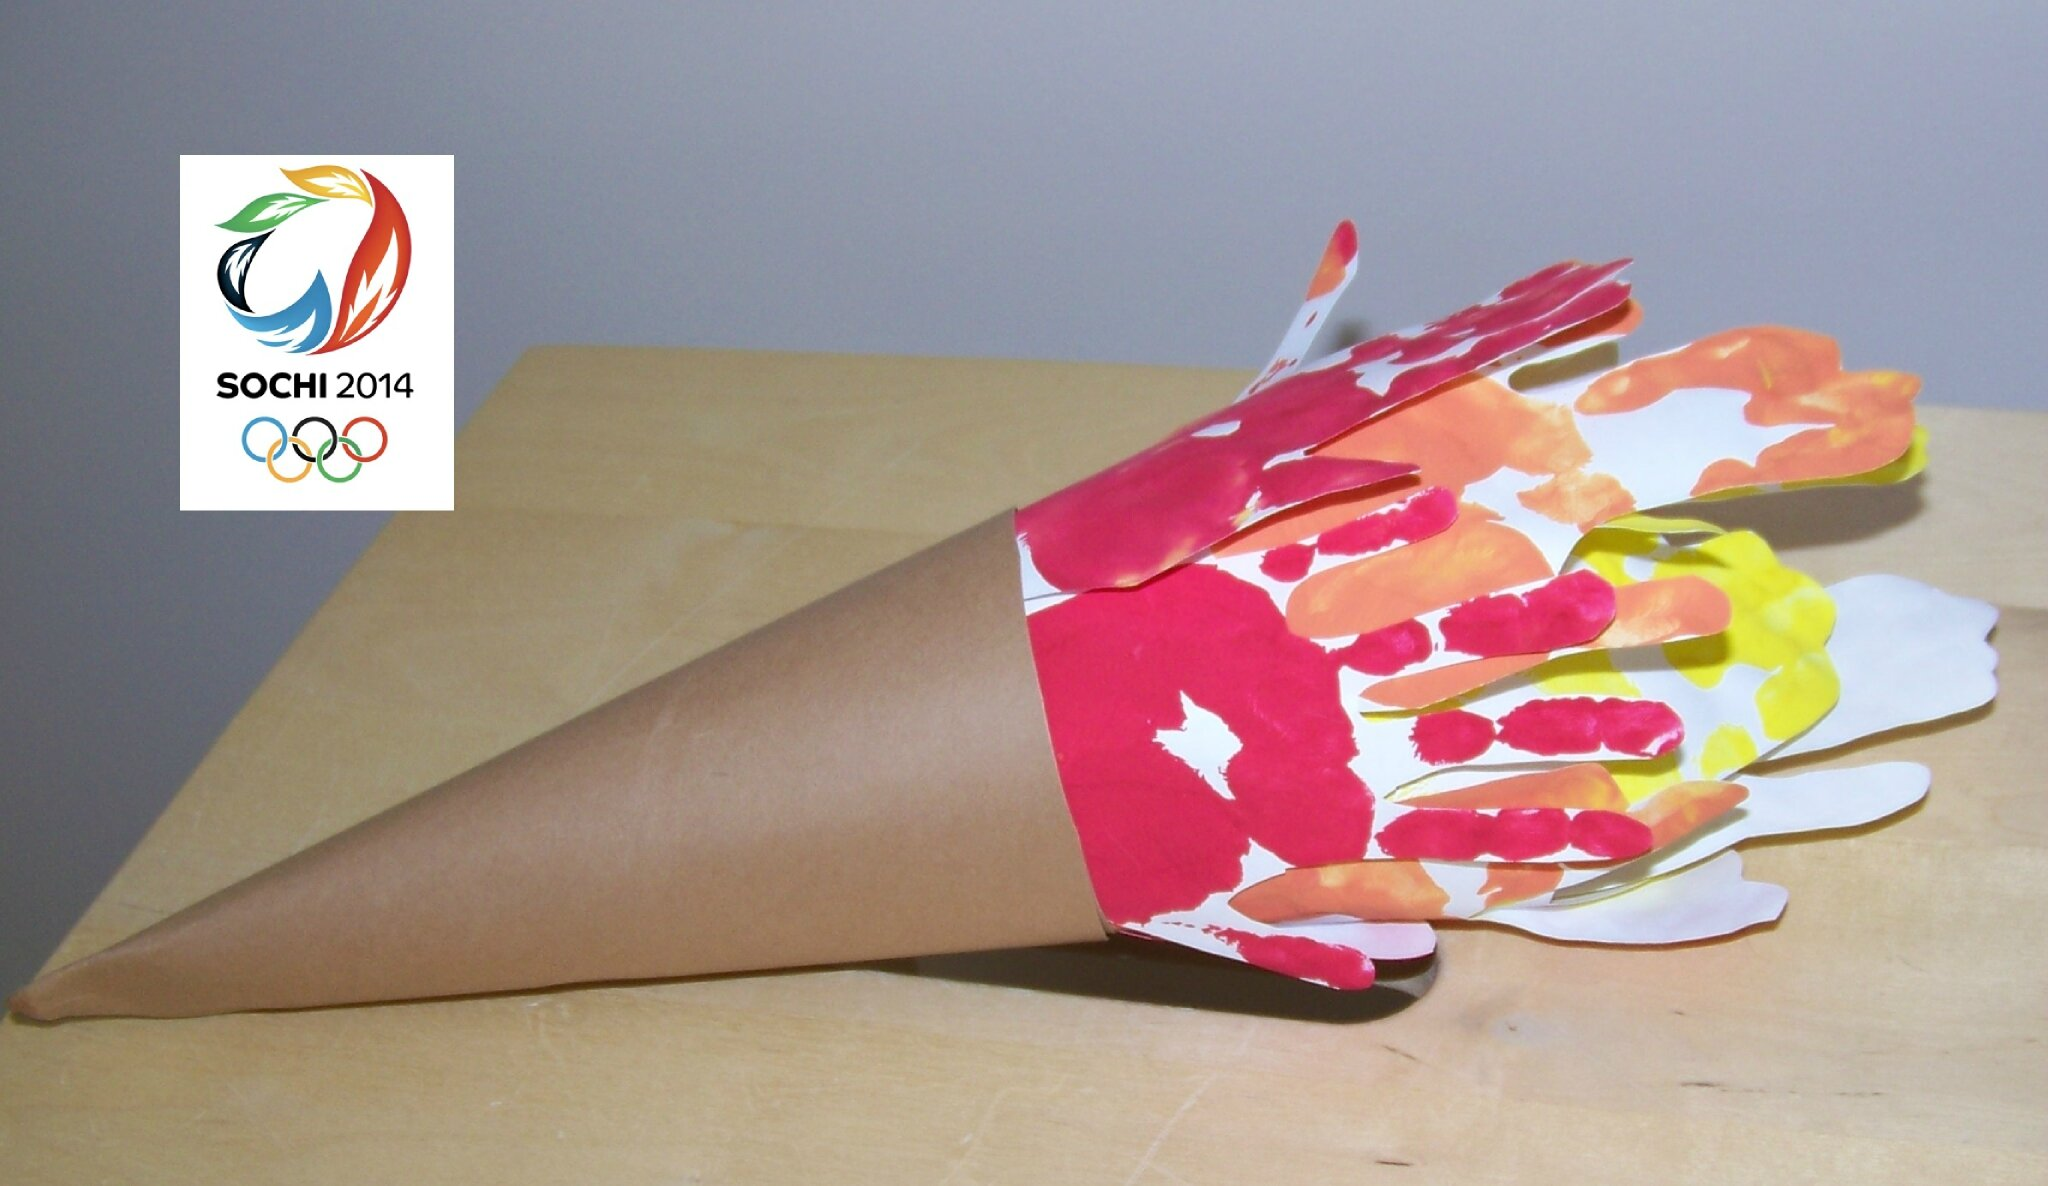 Hervorragend Sochi 2014 - Carottes et couches-culottes GR36